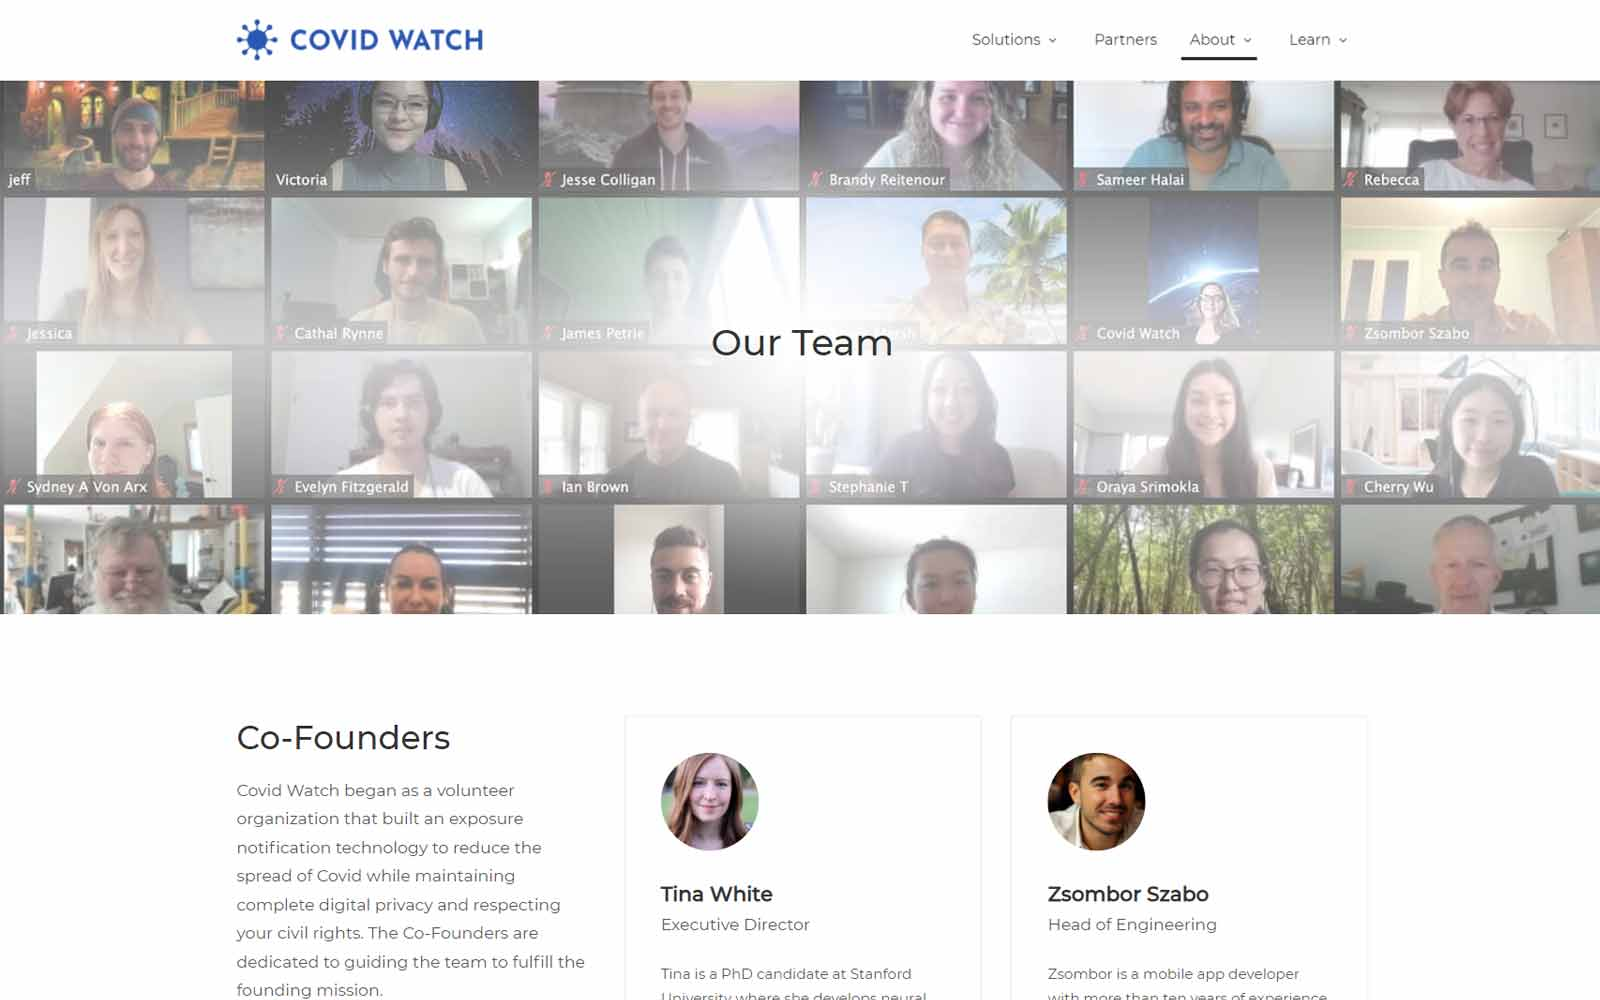 Covid Watch Team